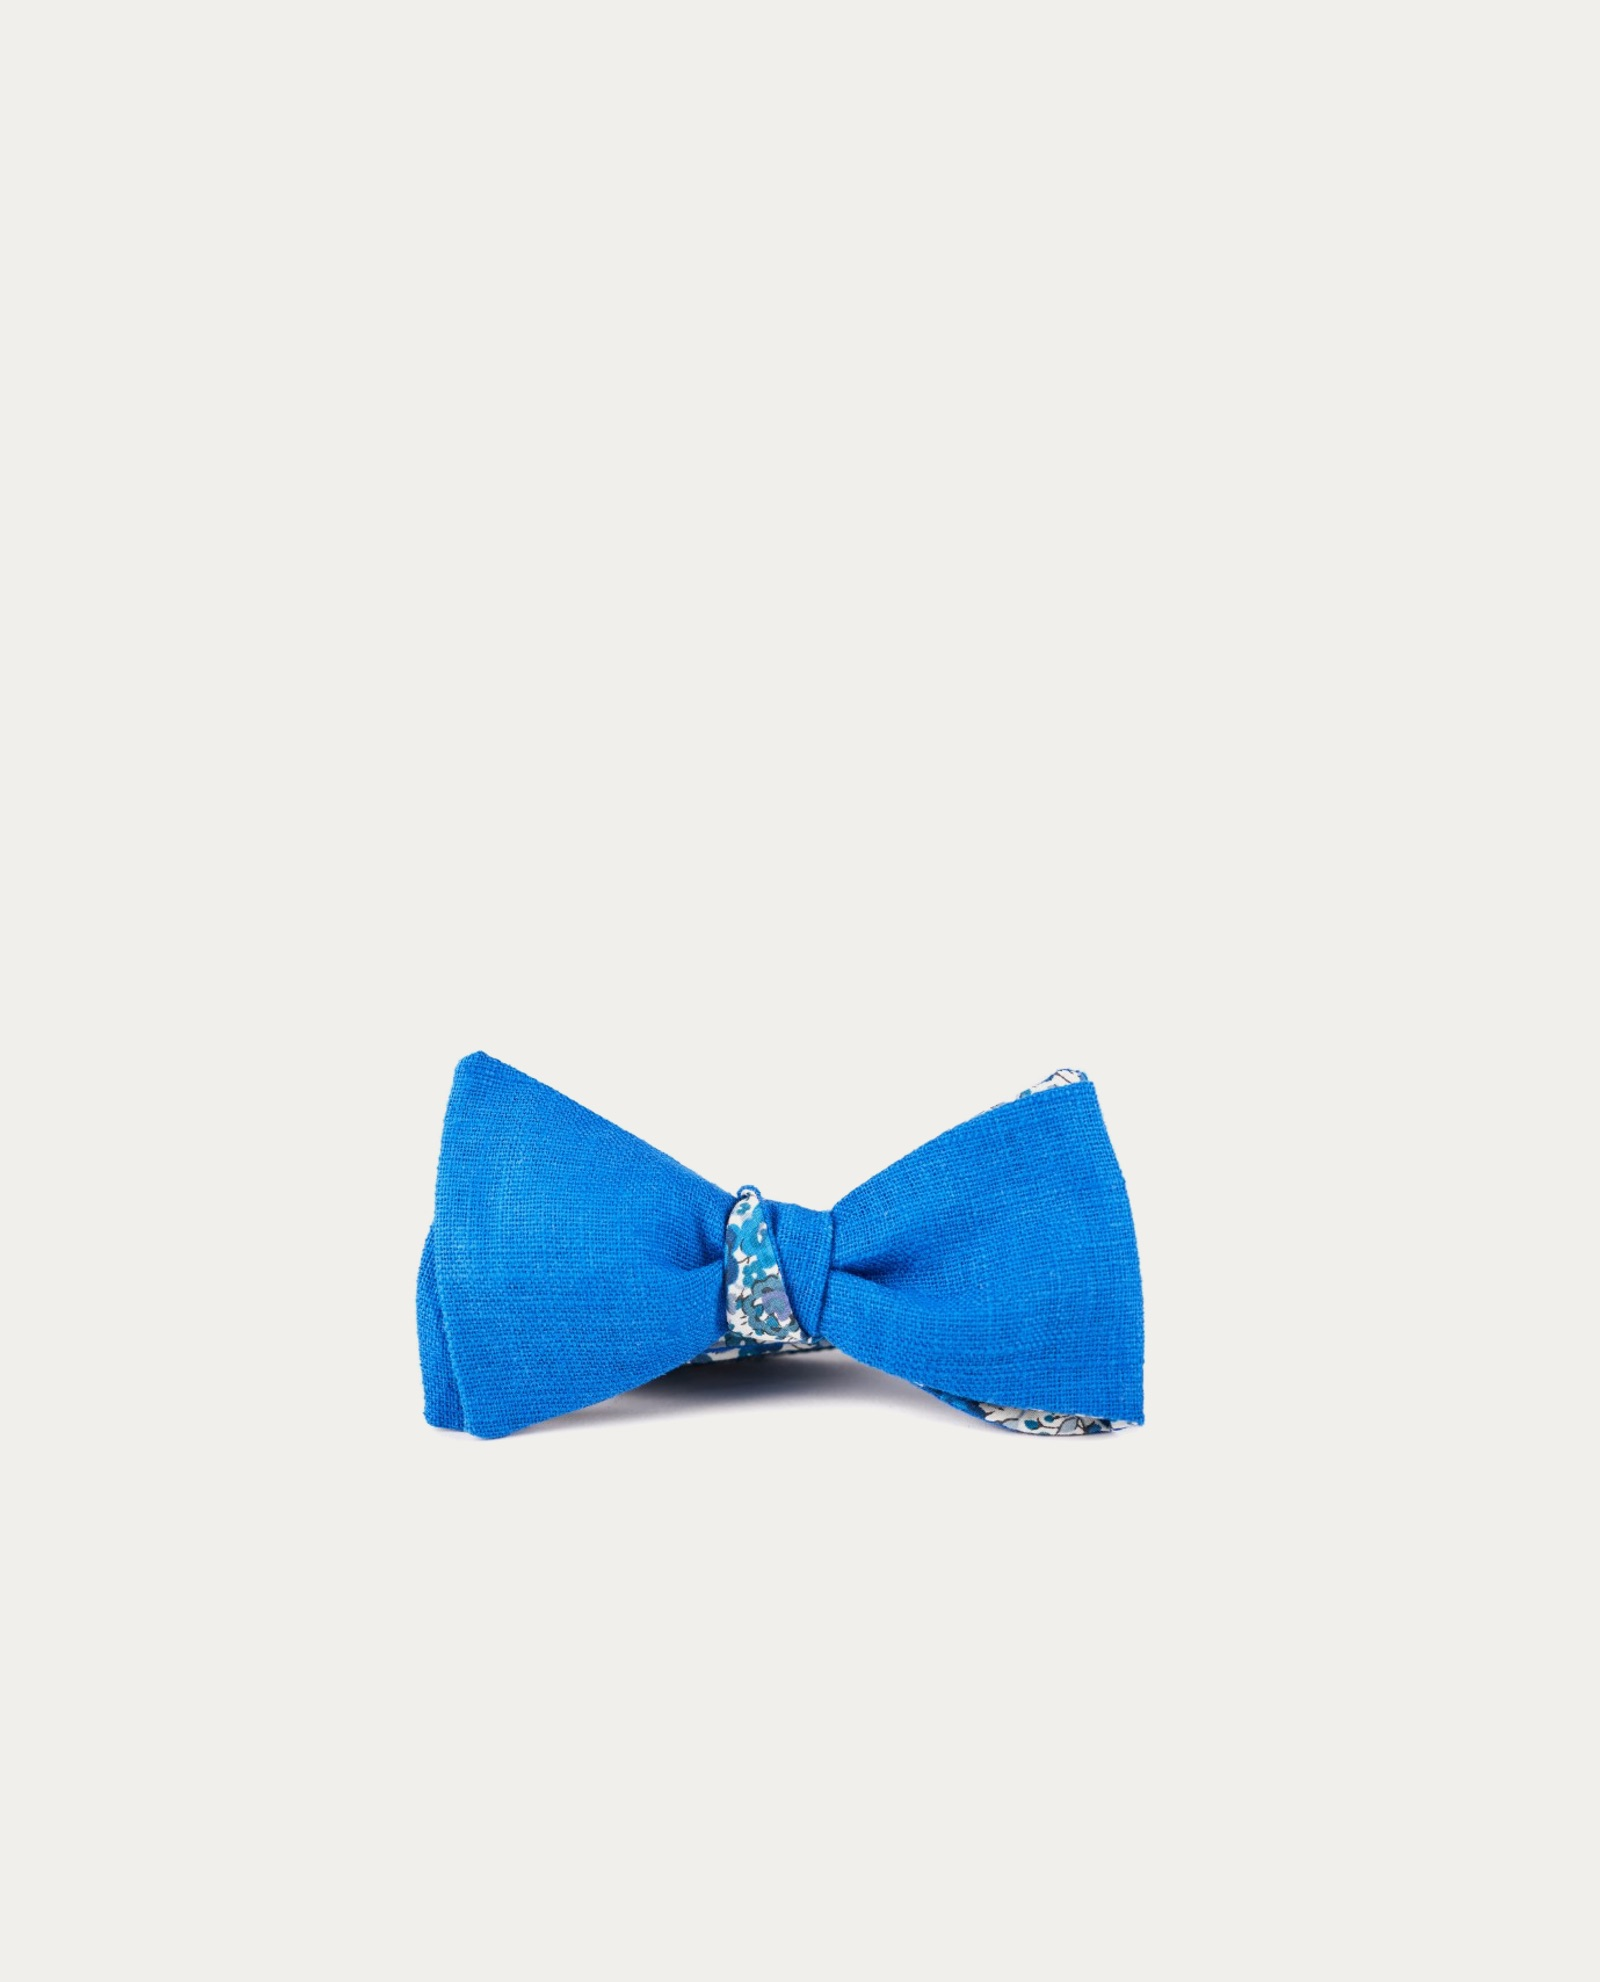 le flageolet noeud papillon emma and georgina revers bleu roi concept store barbier. Black Bedroom Furniture Sets. Home Design Ideas